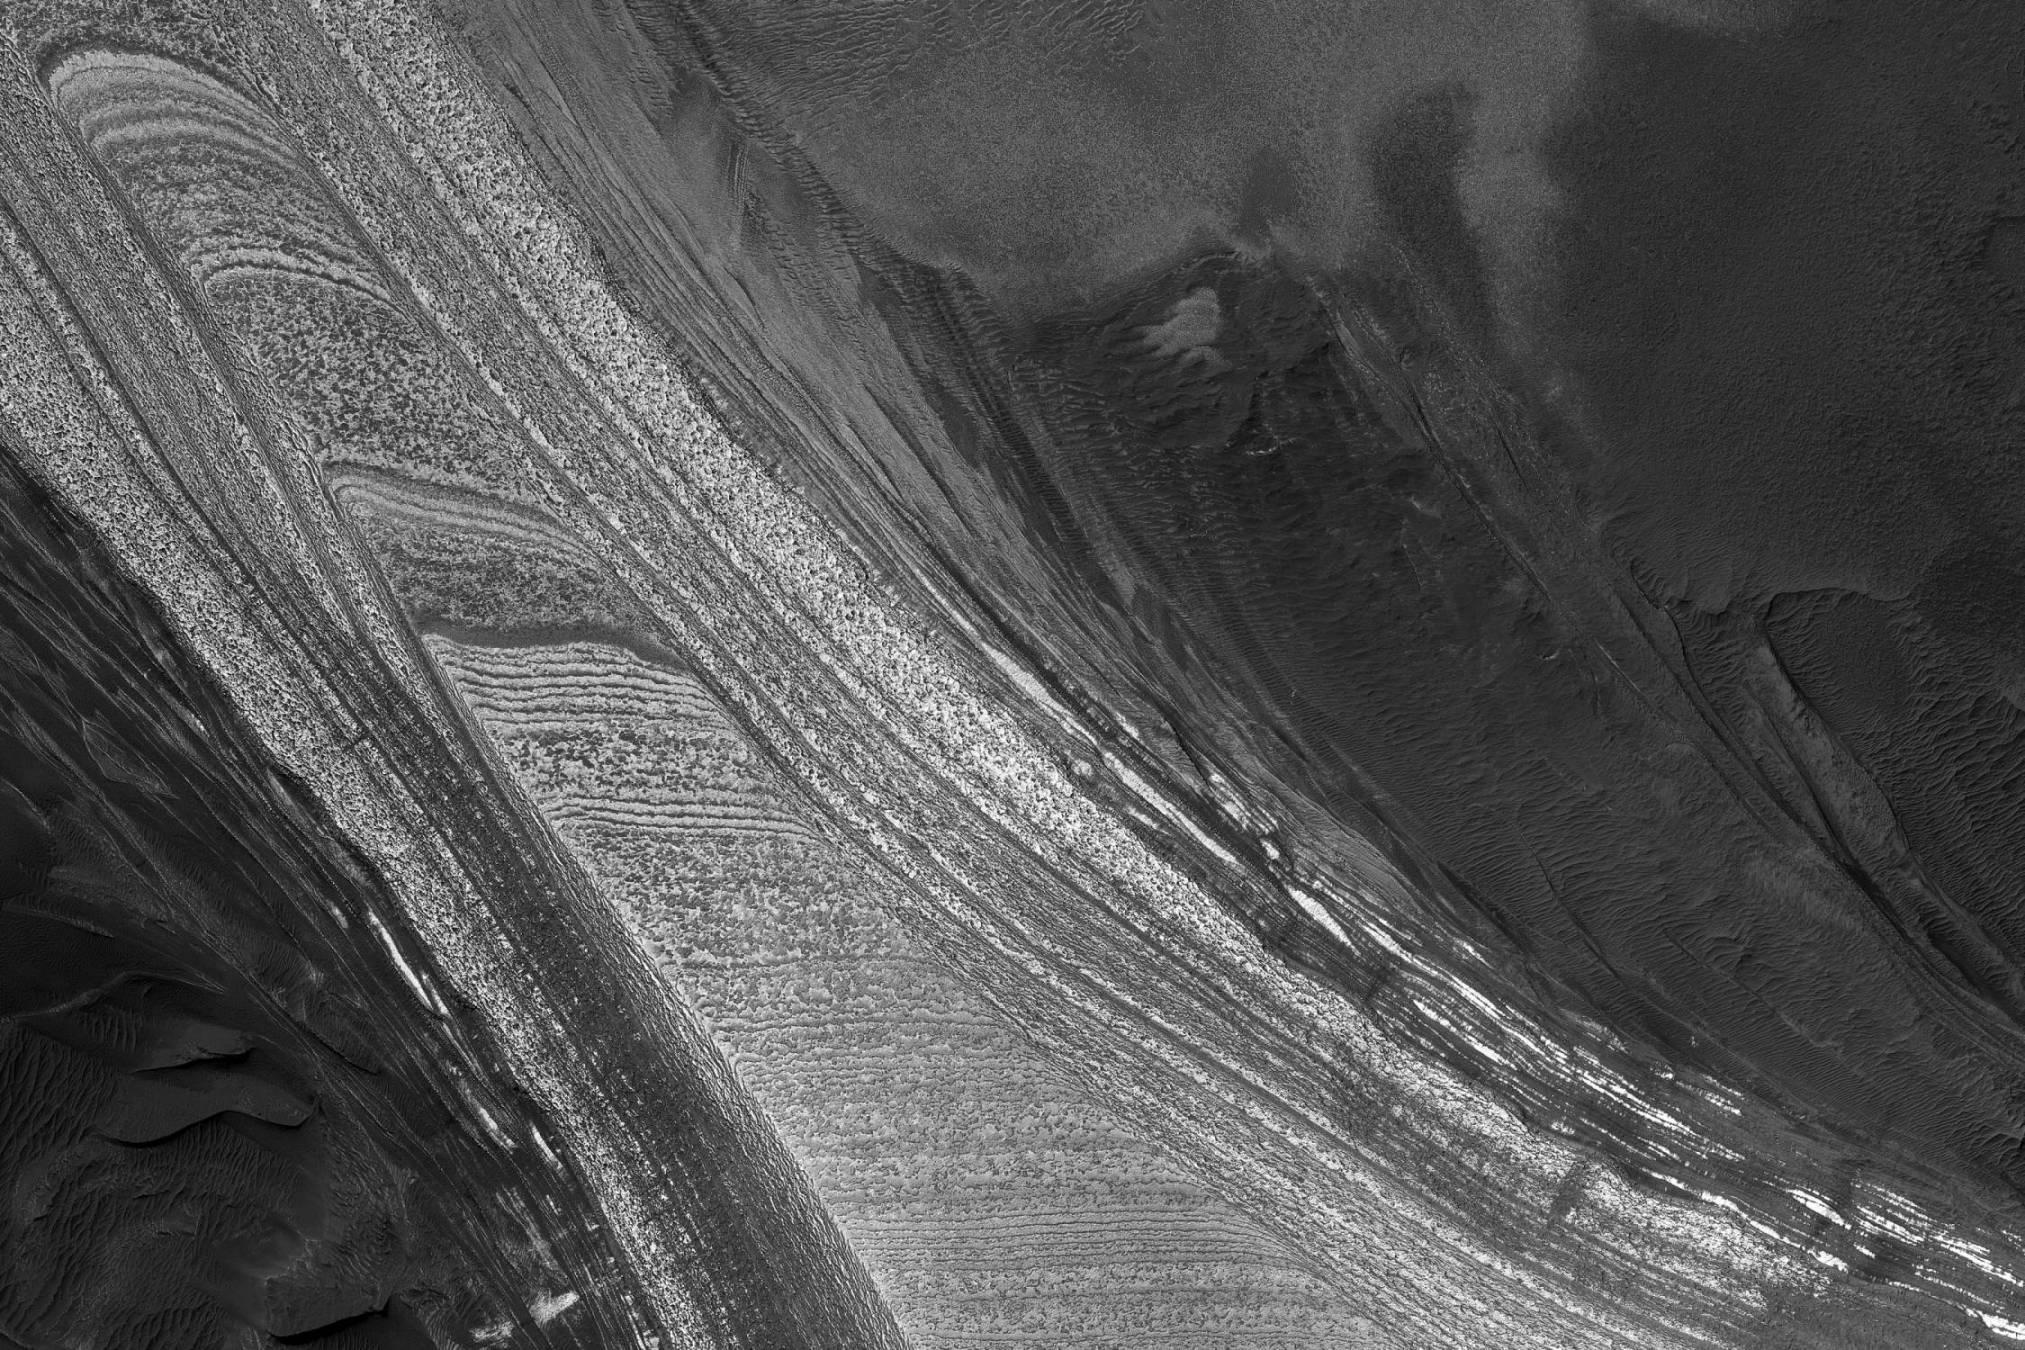 Mars polar ice cap (HiRISE)